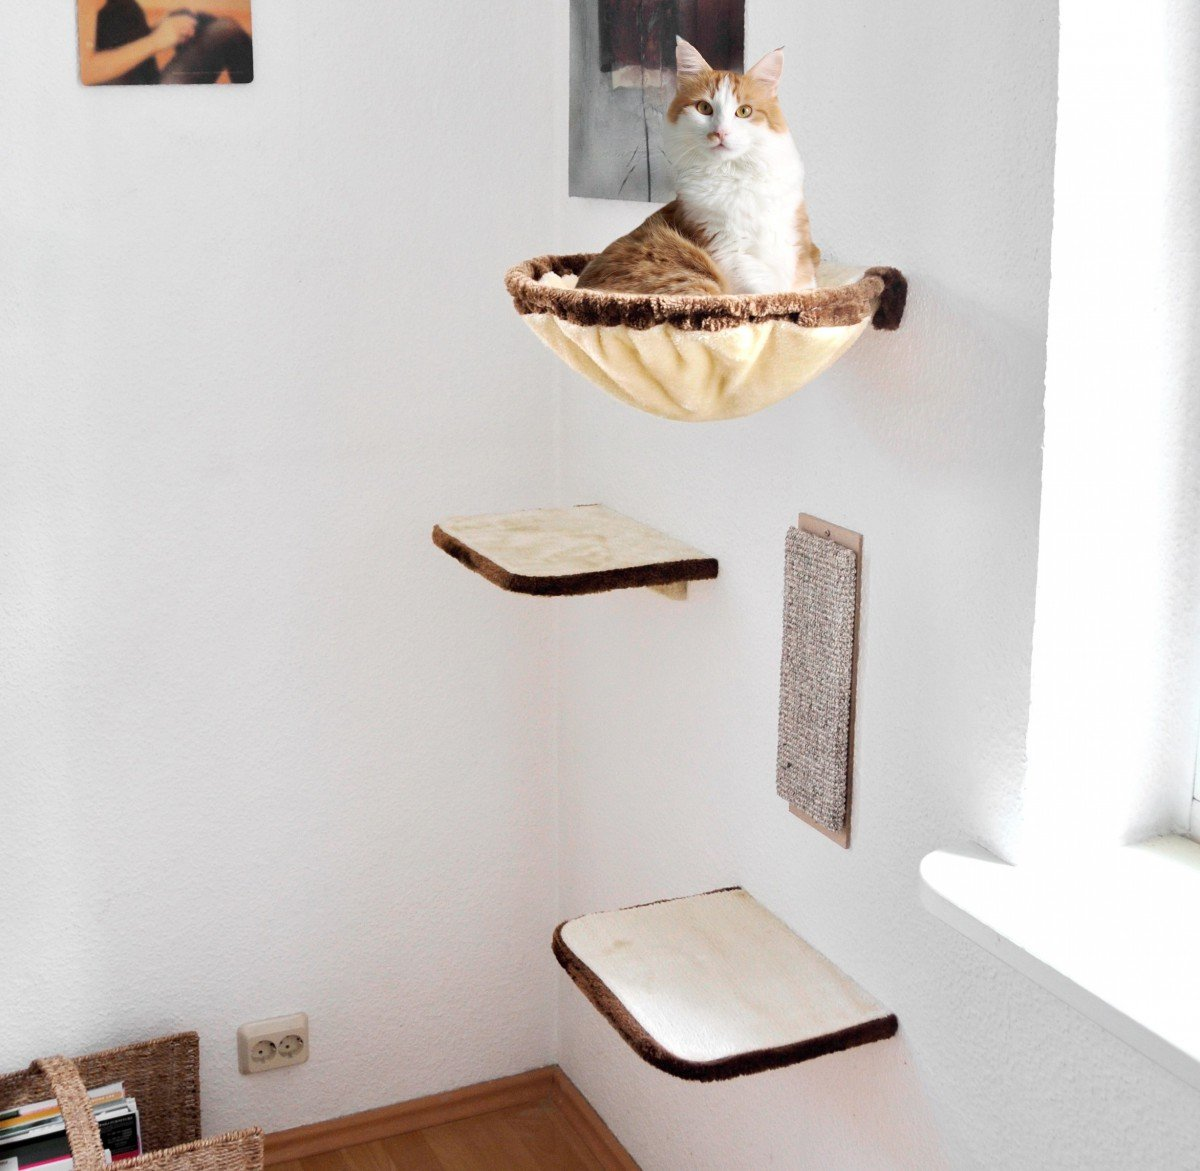 rezension silvio design katzen-kletterwand 4-teilig